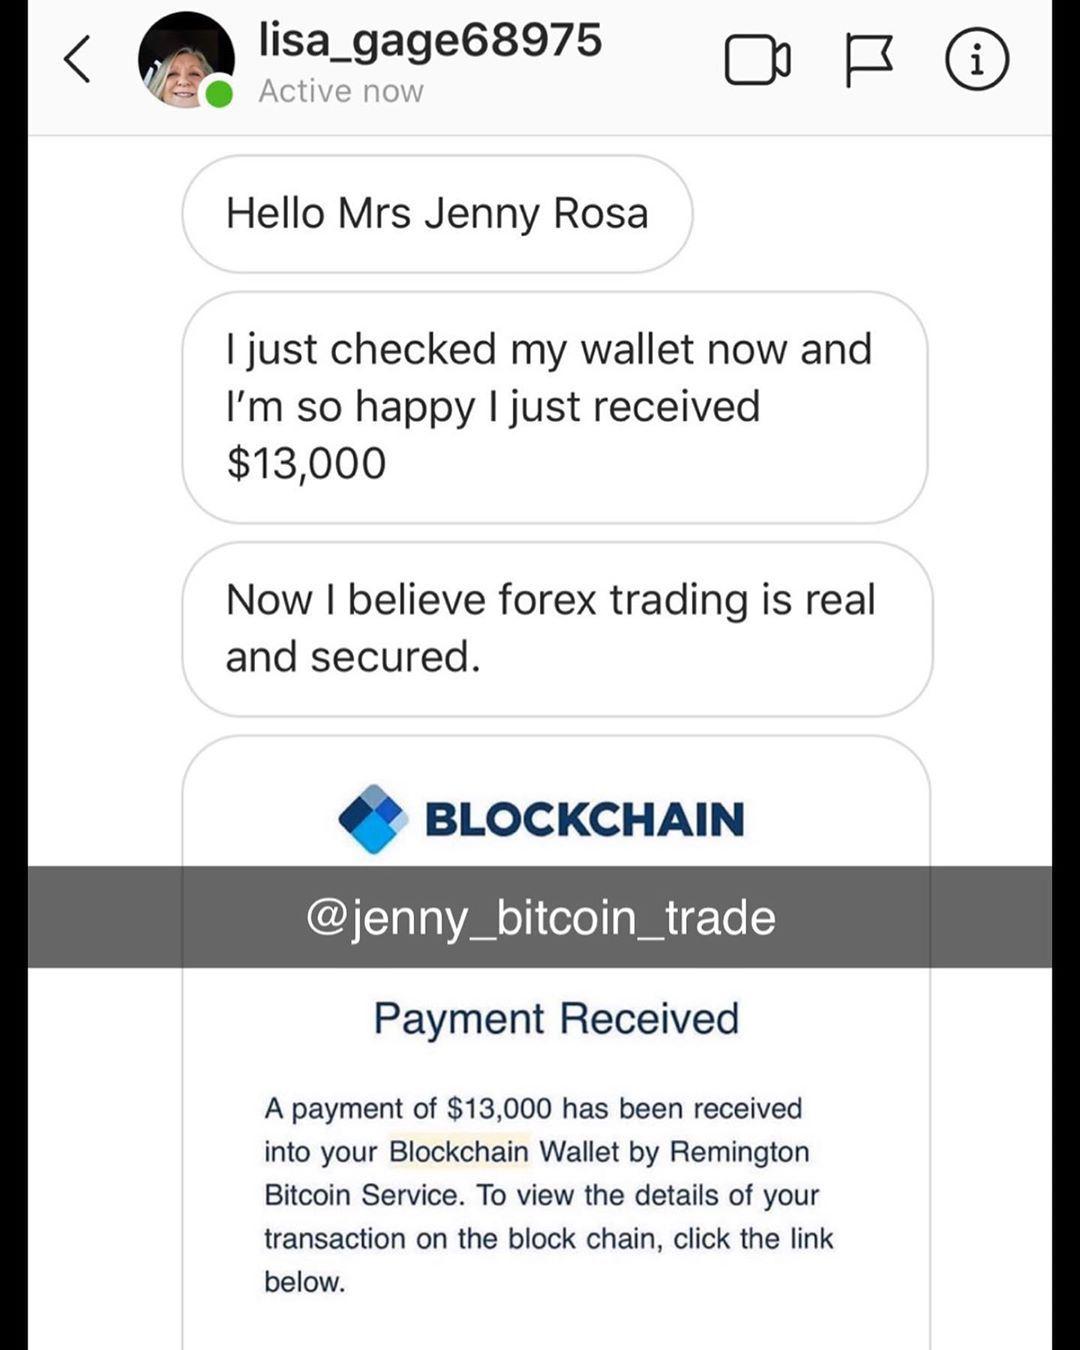 ana rosa bitcoin trader